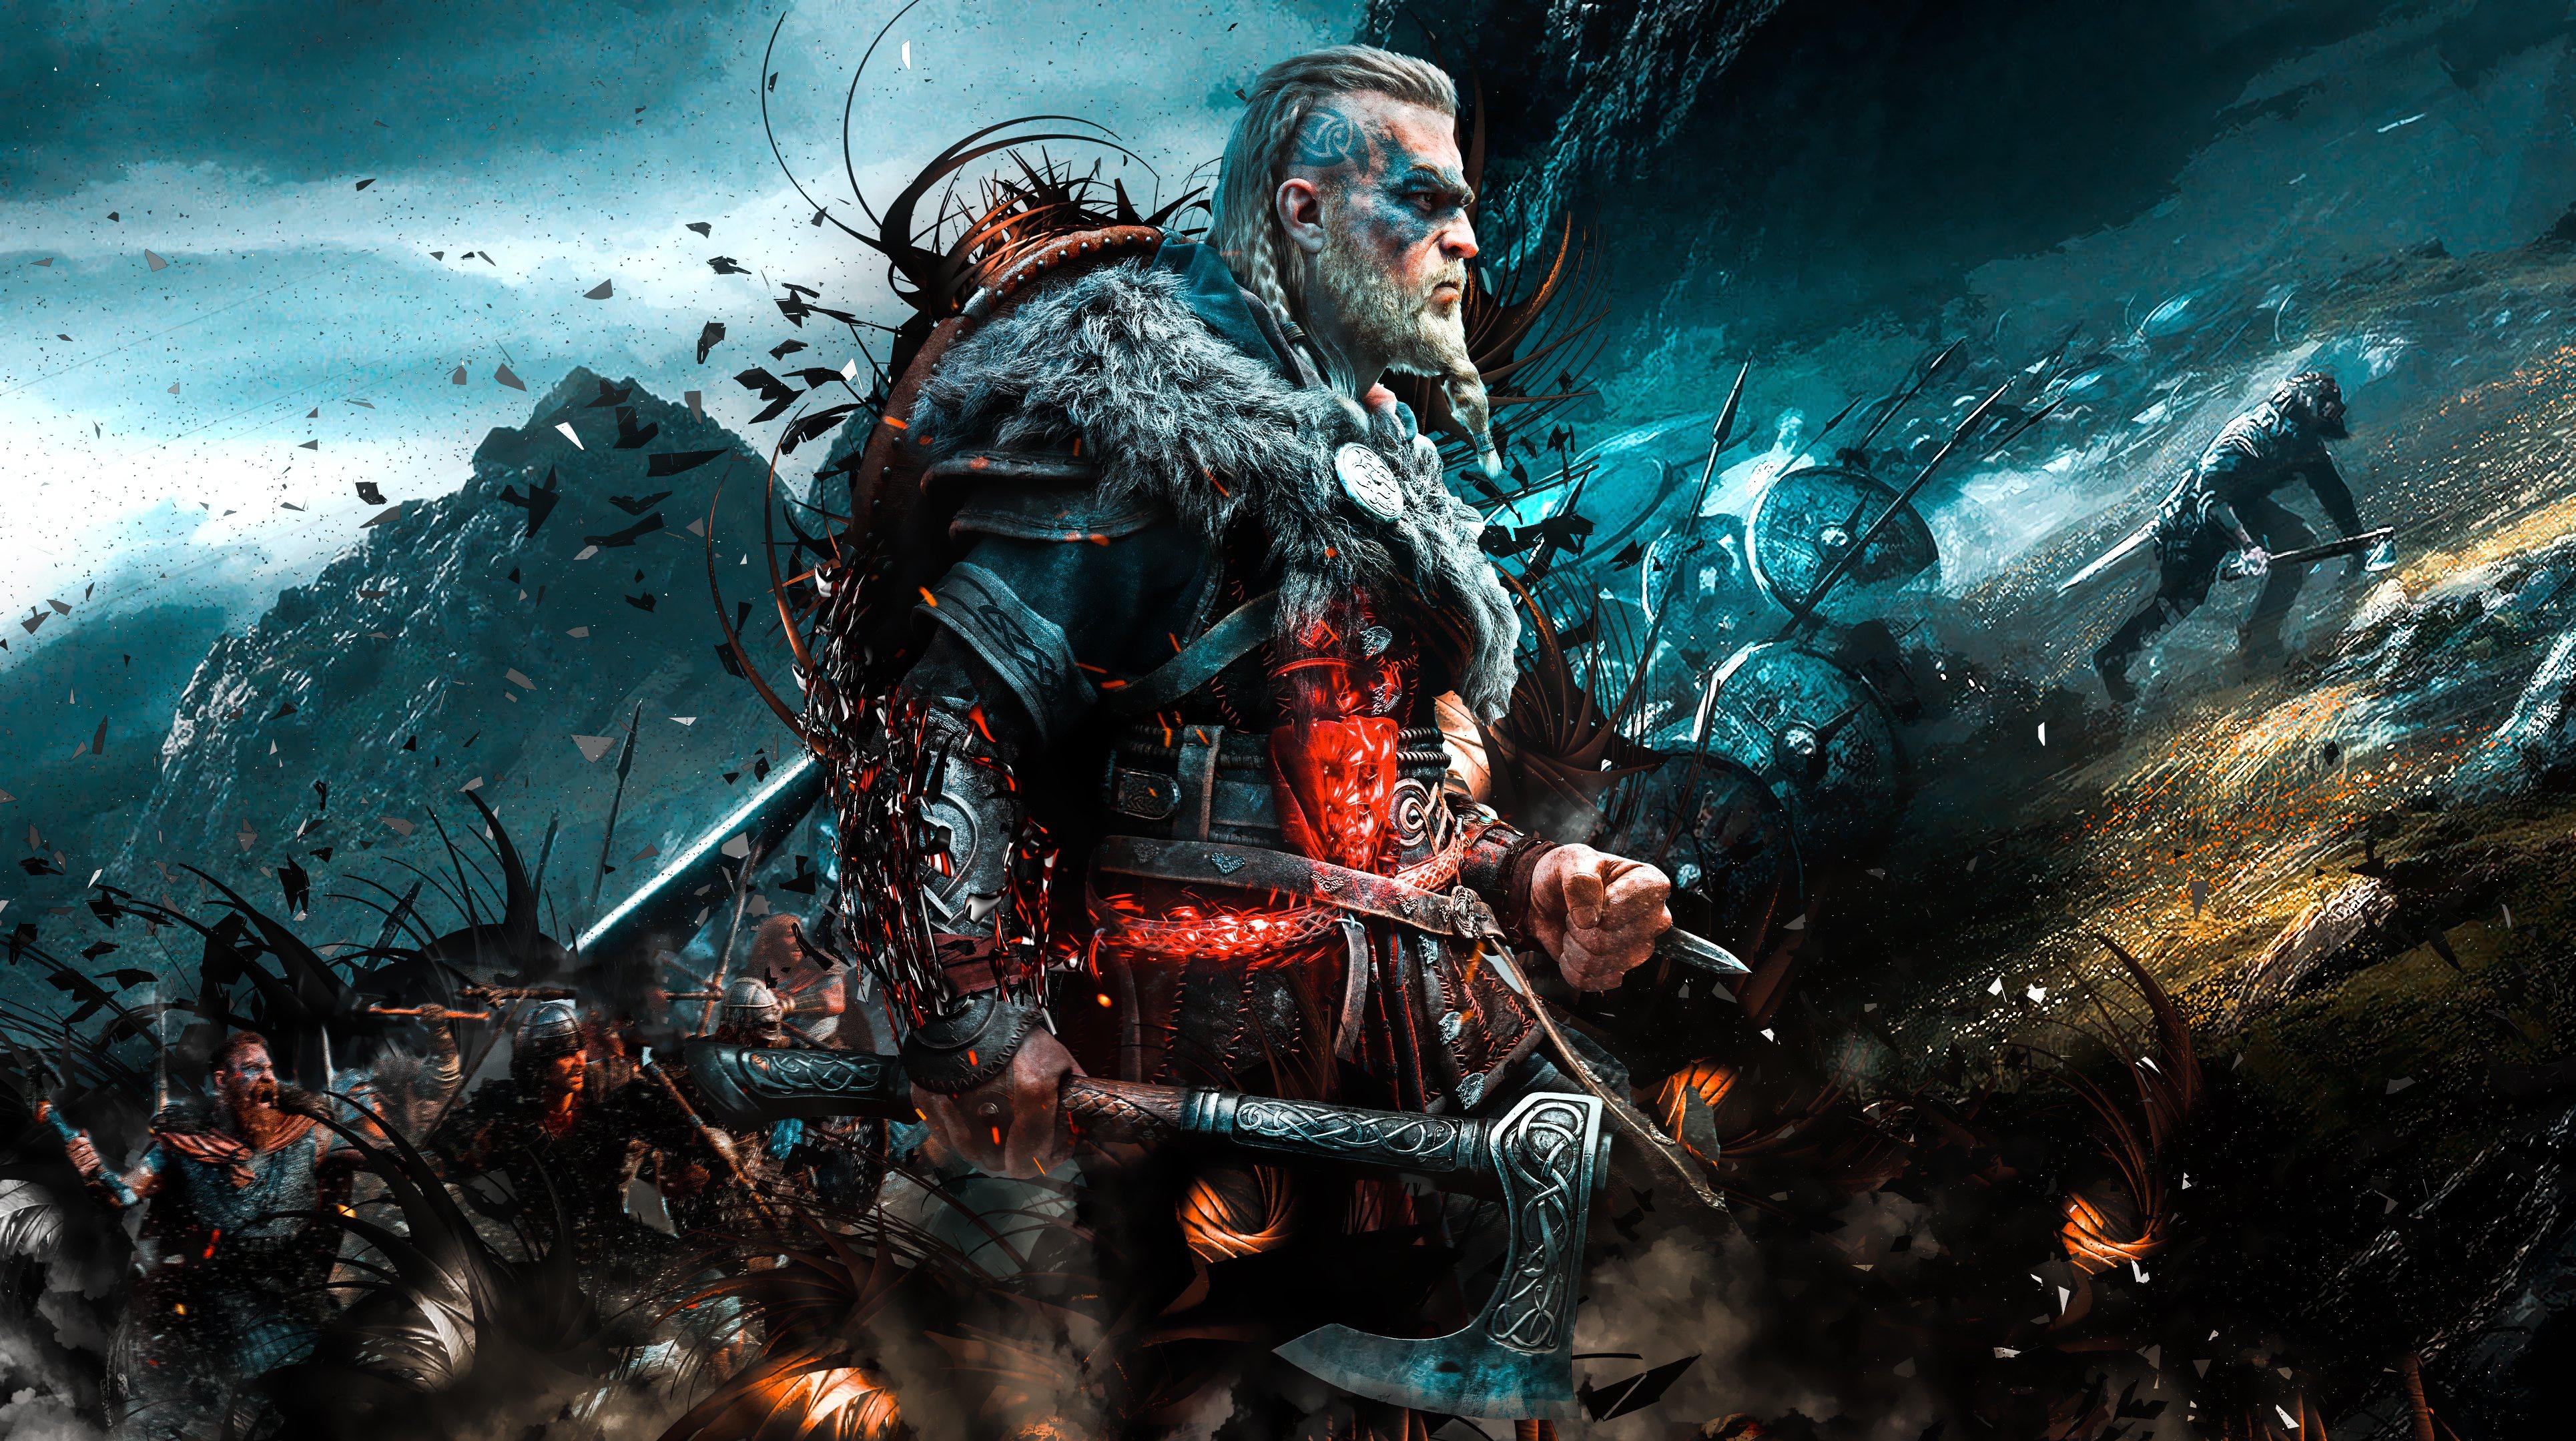 Assassin S Creed Valhalla 4k Wallpaper Viking Raider Eivor Pc Games Playstation 4 Playstation 5 Xbox One Games 601